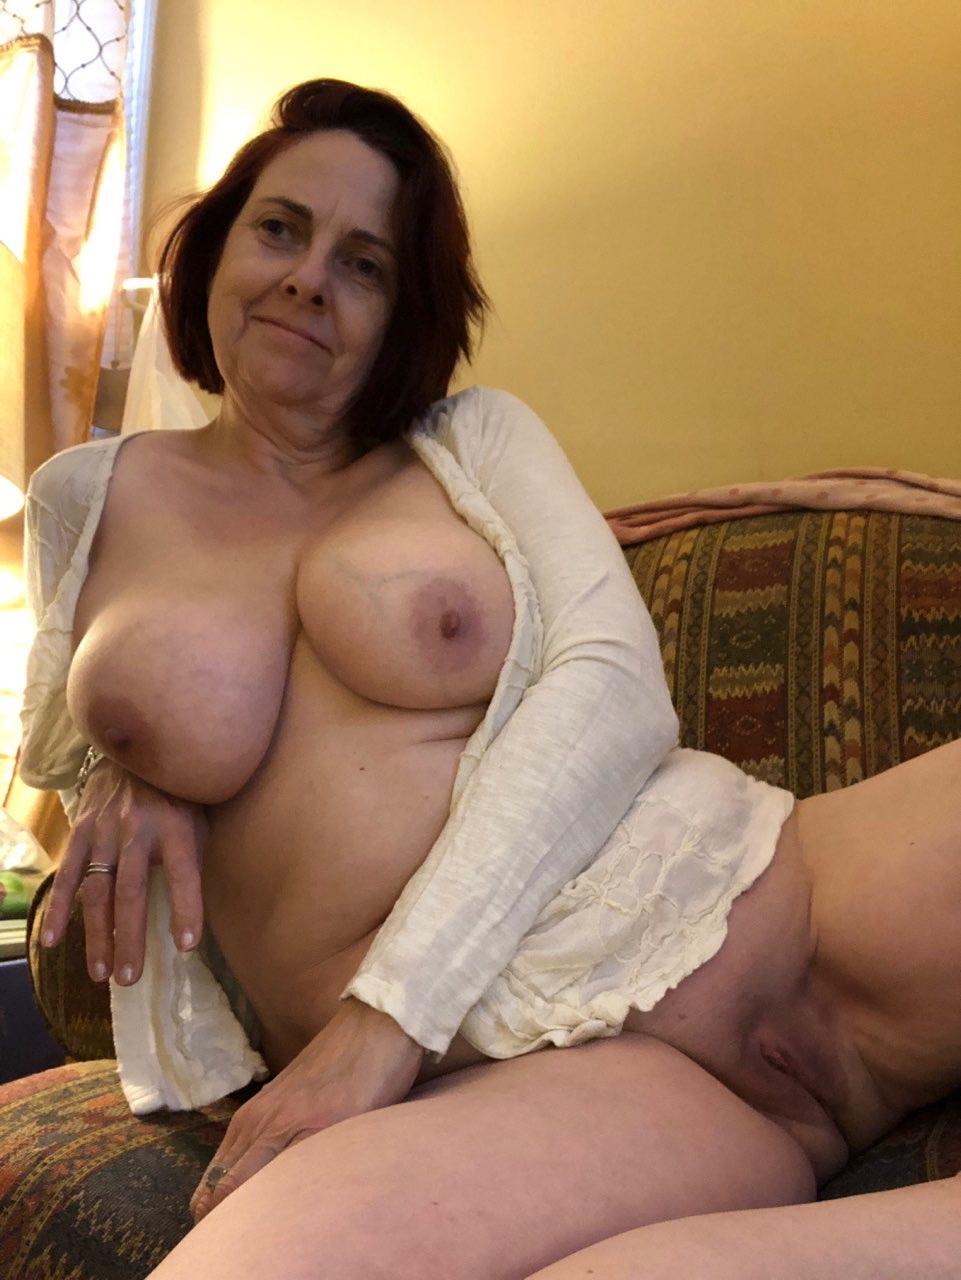 Brunette Mom - Mr Big amatuer mature brunette mom porn pics - MatureHomemadePorn.com